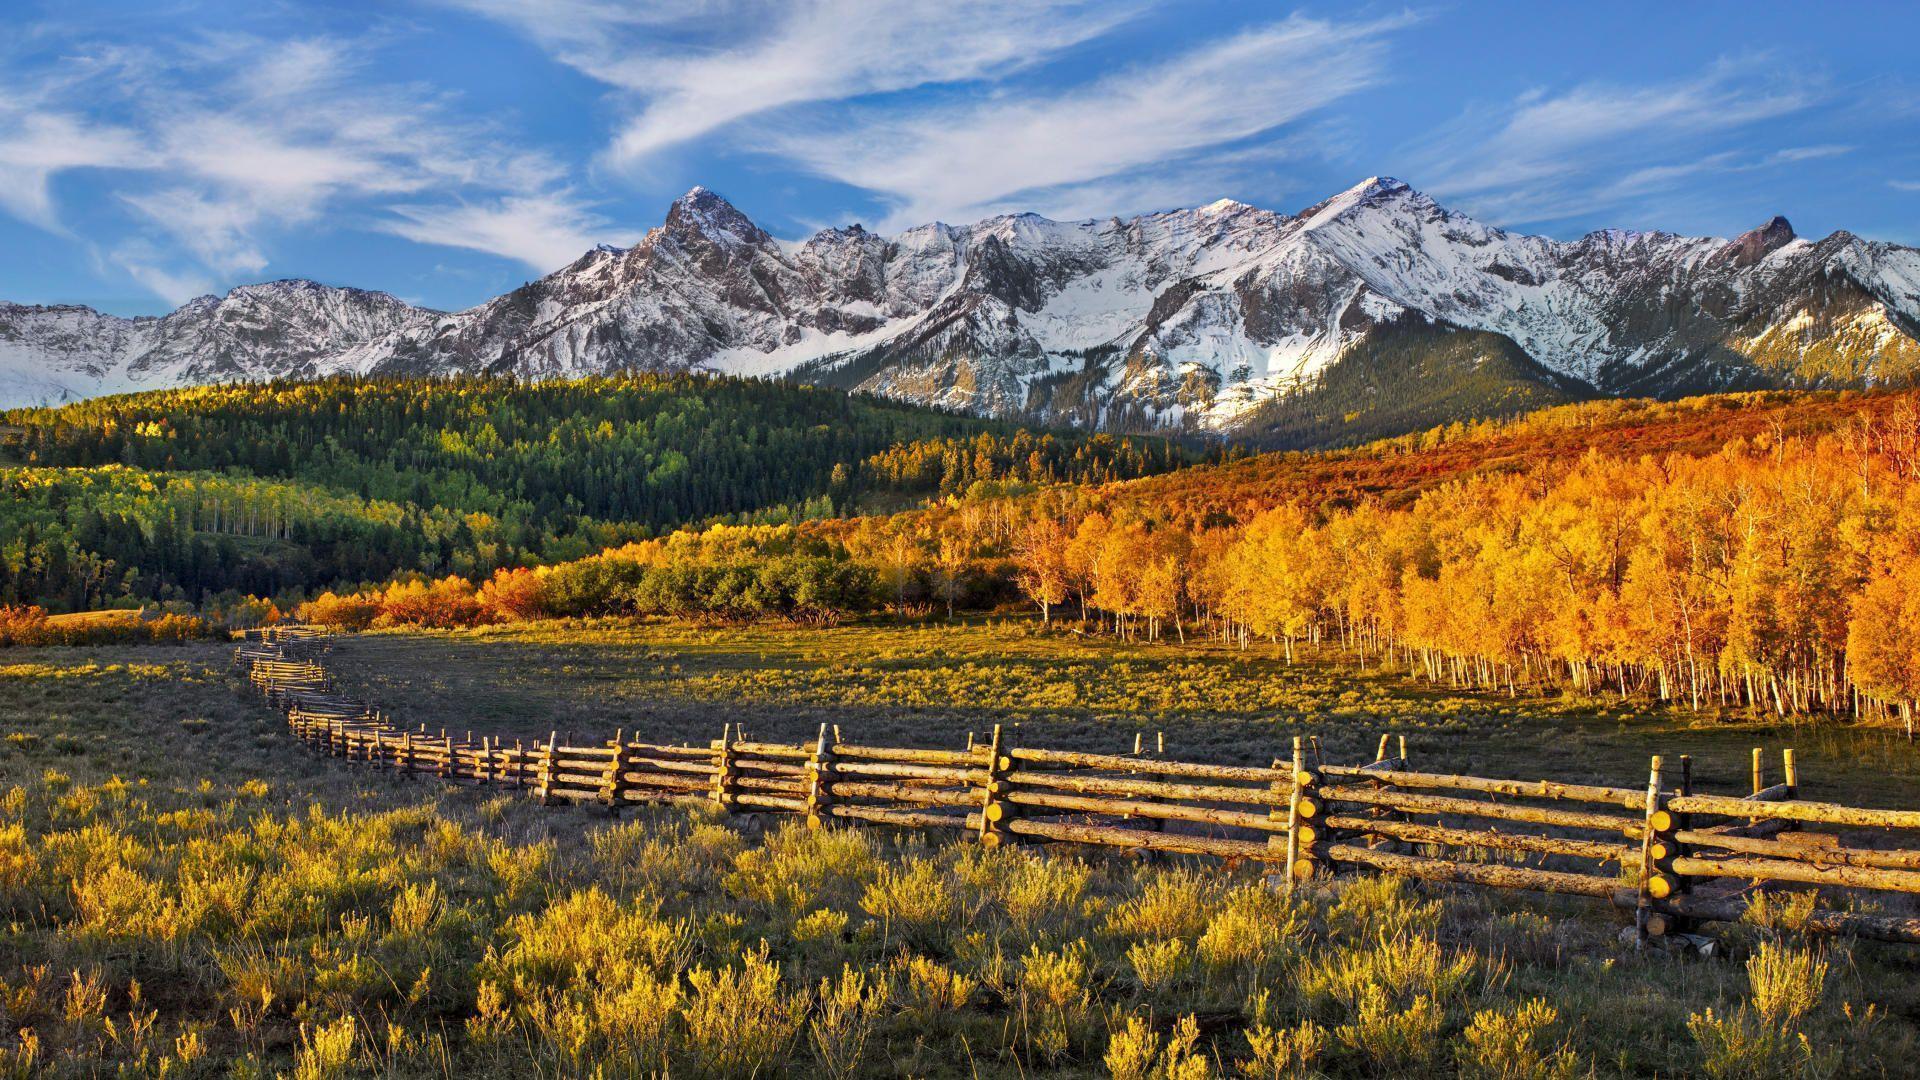 Colorado Wallpapers   4k HD Colorado Backgrounds on WallpaperBat 1920x1080